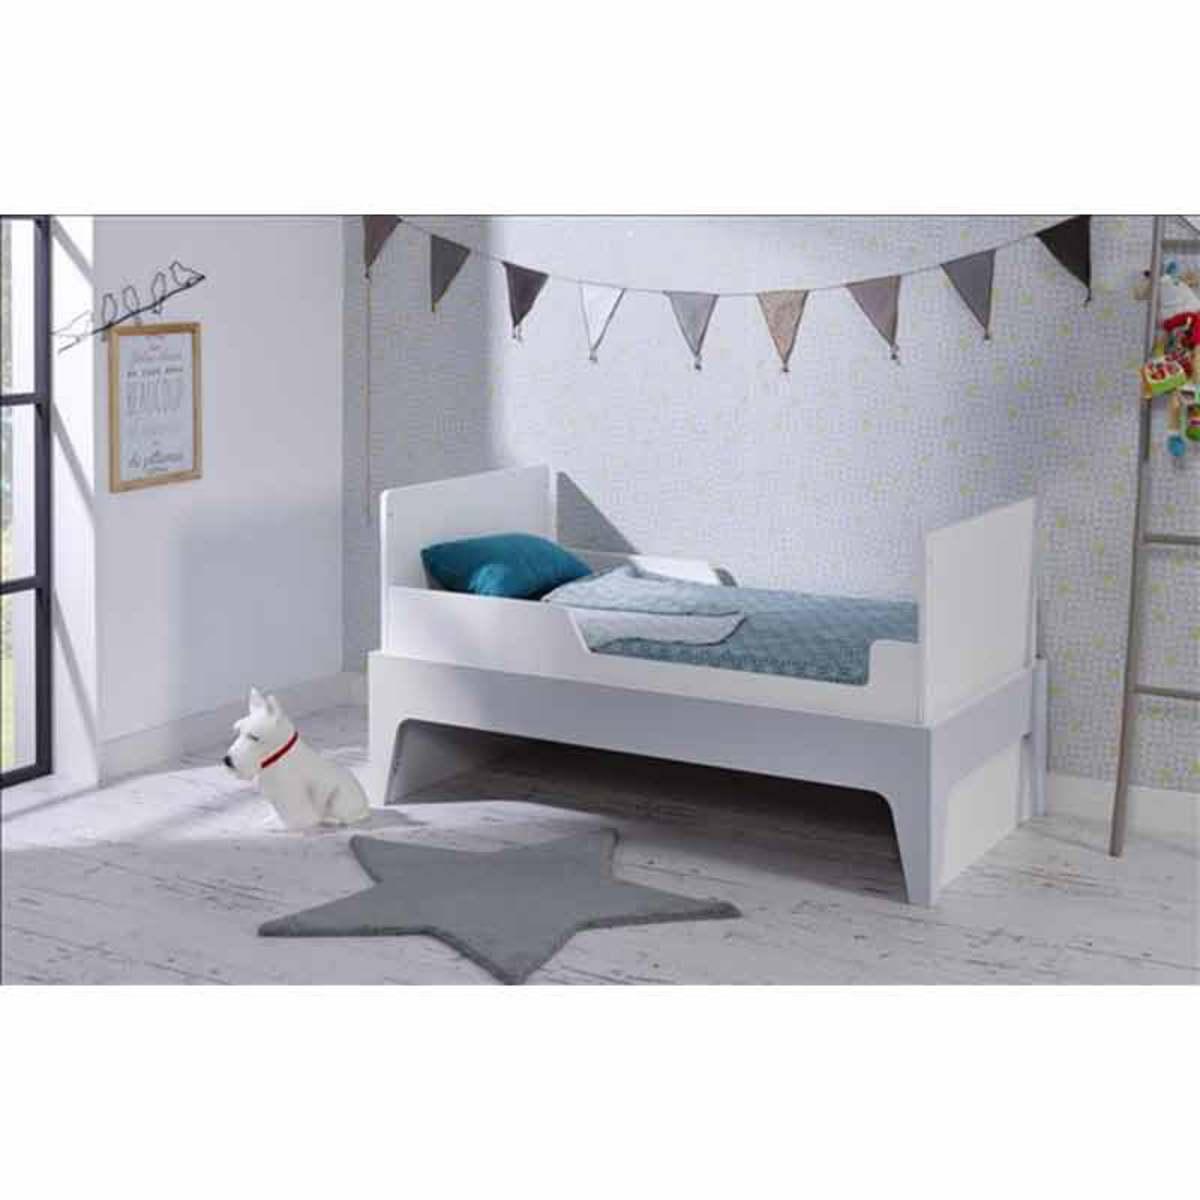 b b provence lit b b 70 x 140 cm paris evolutif barreaux blanc gris lit b b b b provence. Black Bedroom Furniture Sets. Home Design Ideas